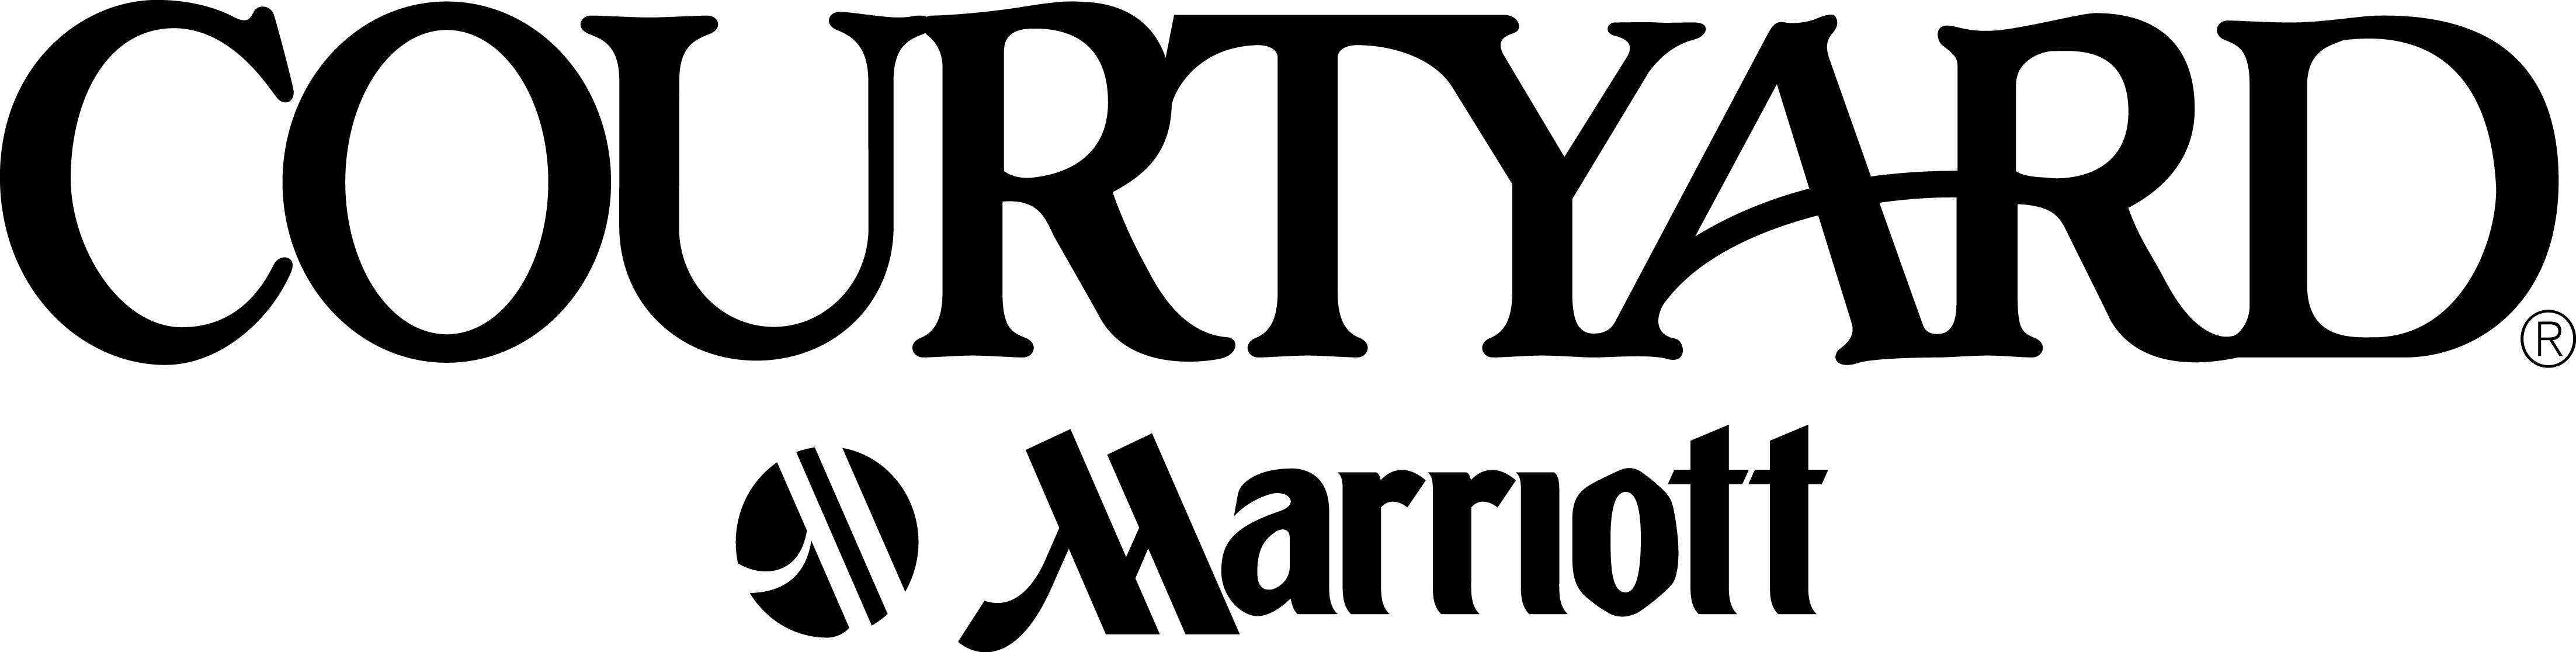 Courtyard marriott Logos.